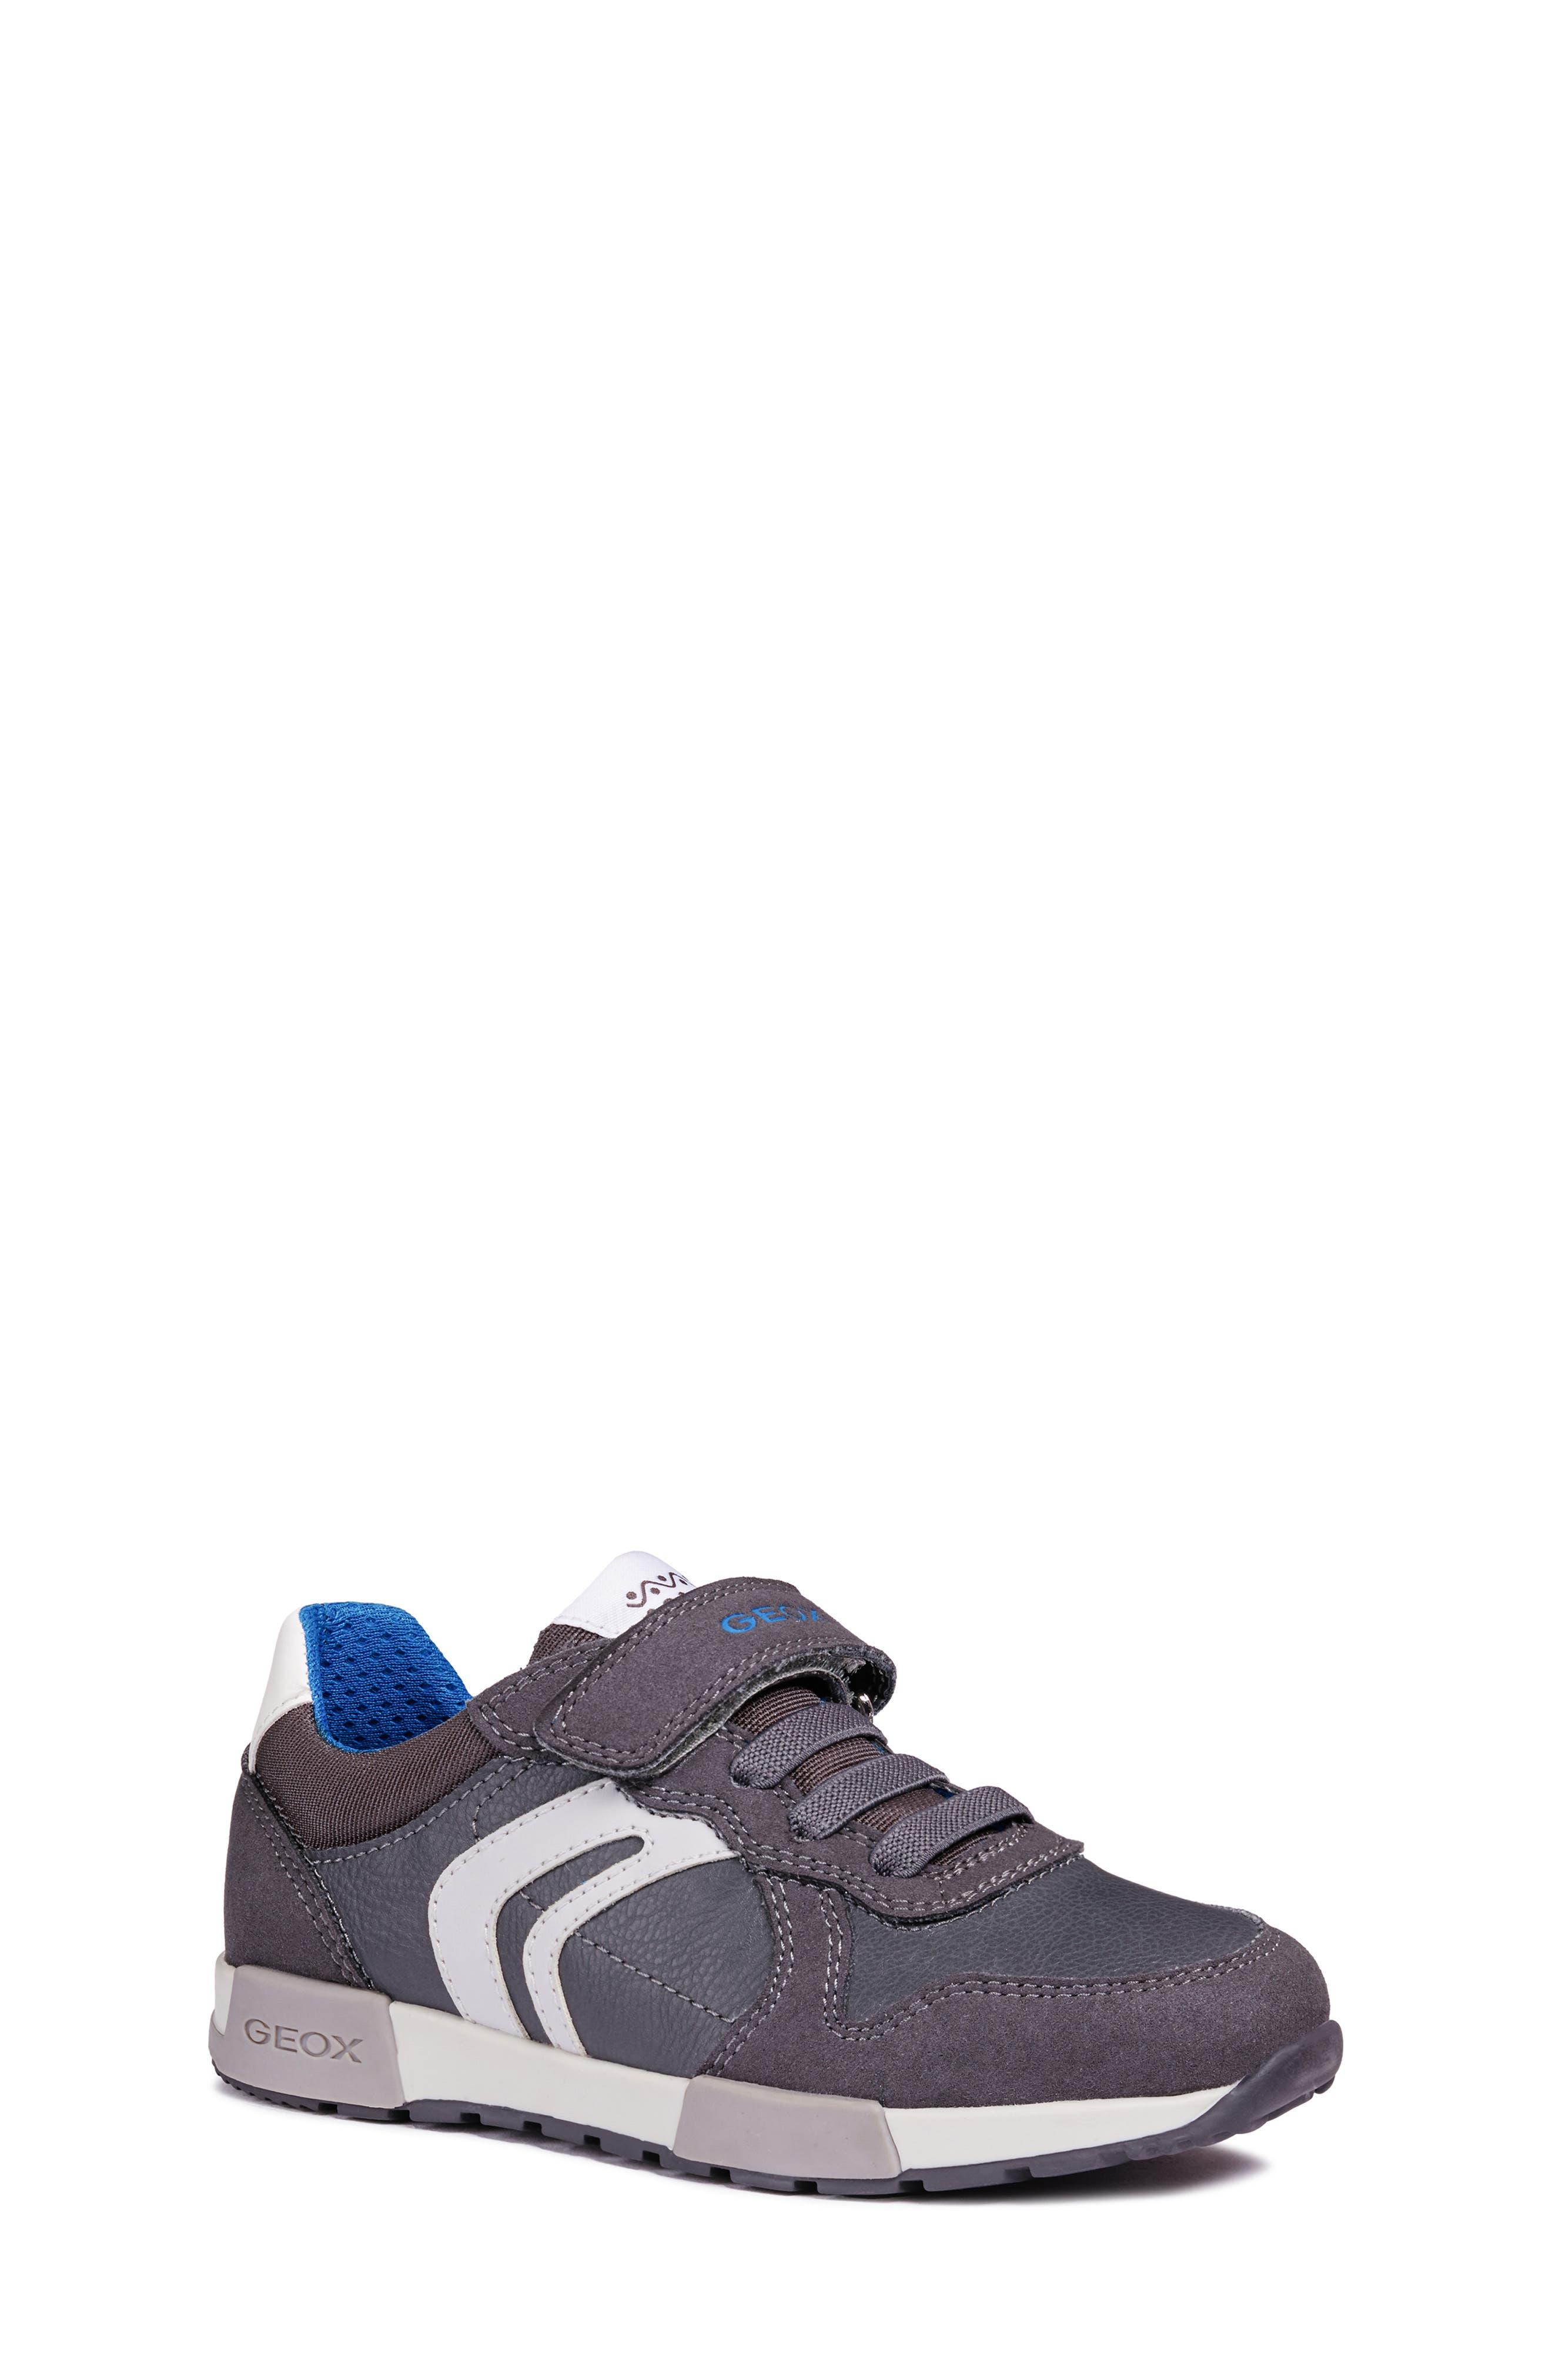 Alfier Boy Sneaker,                             Main thumbnail 1, color,                             DARK GREY/GREY